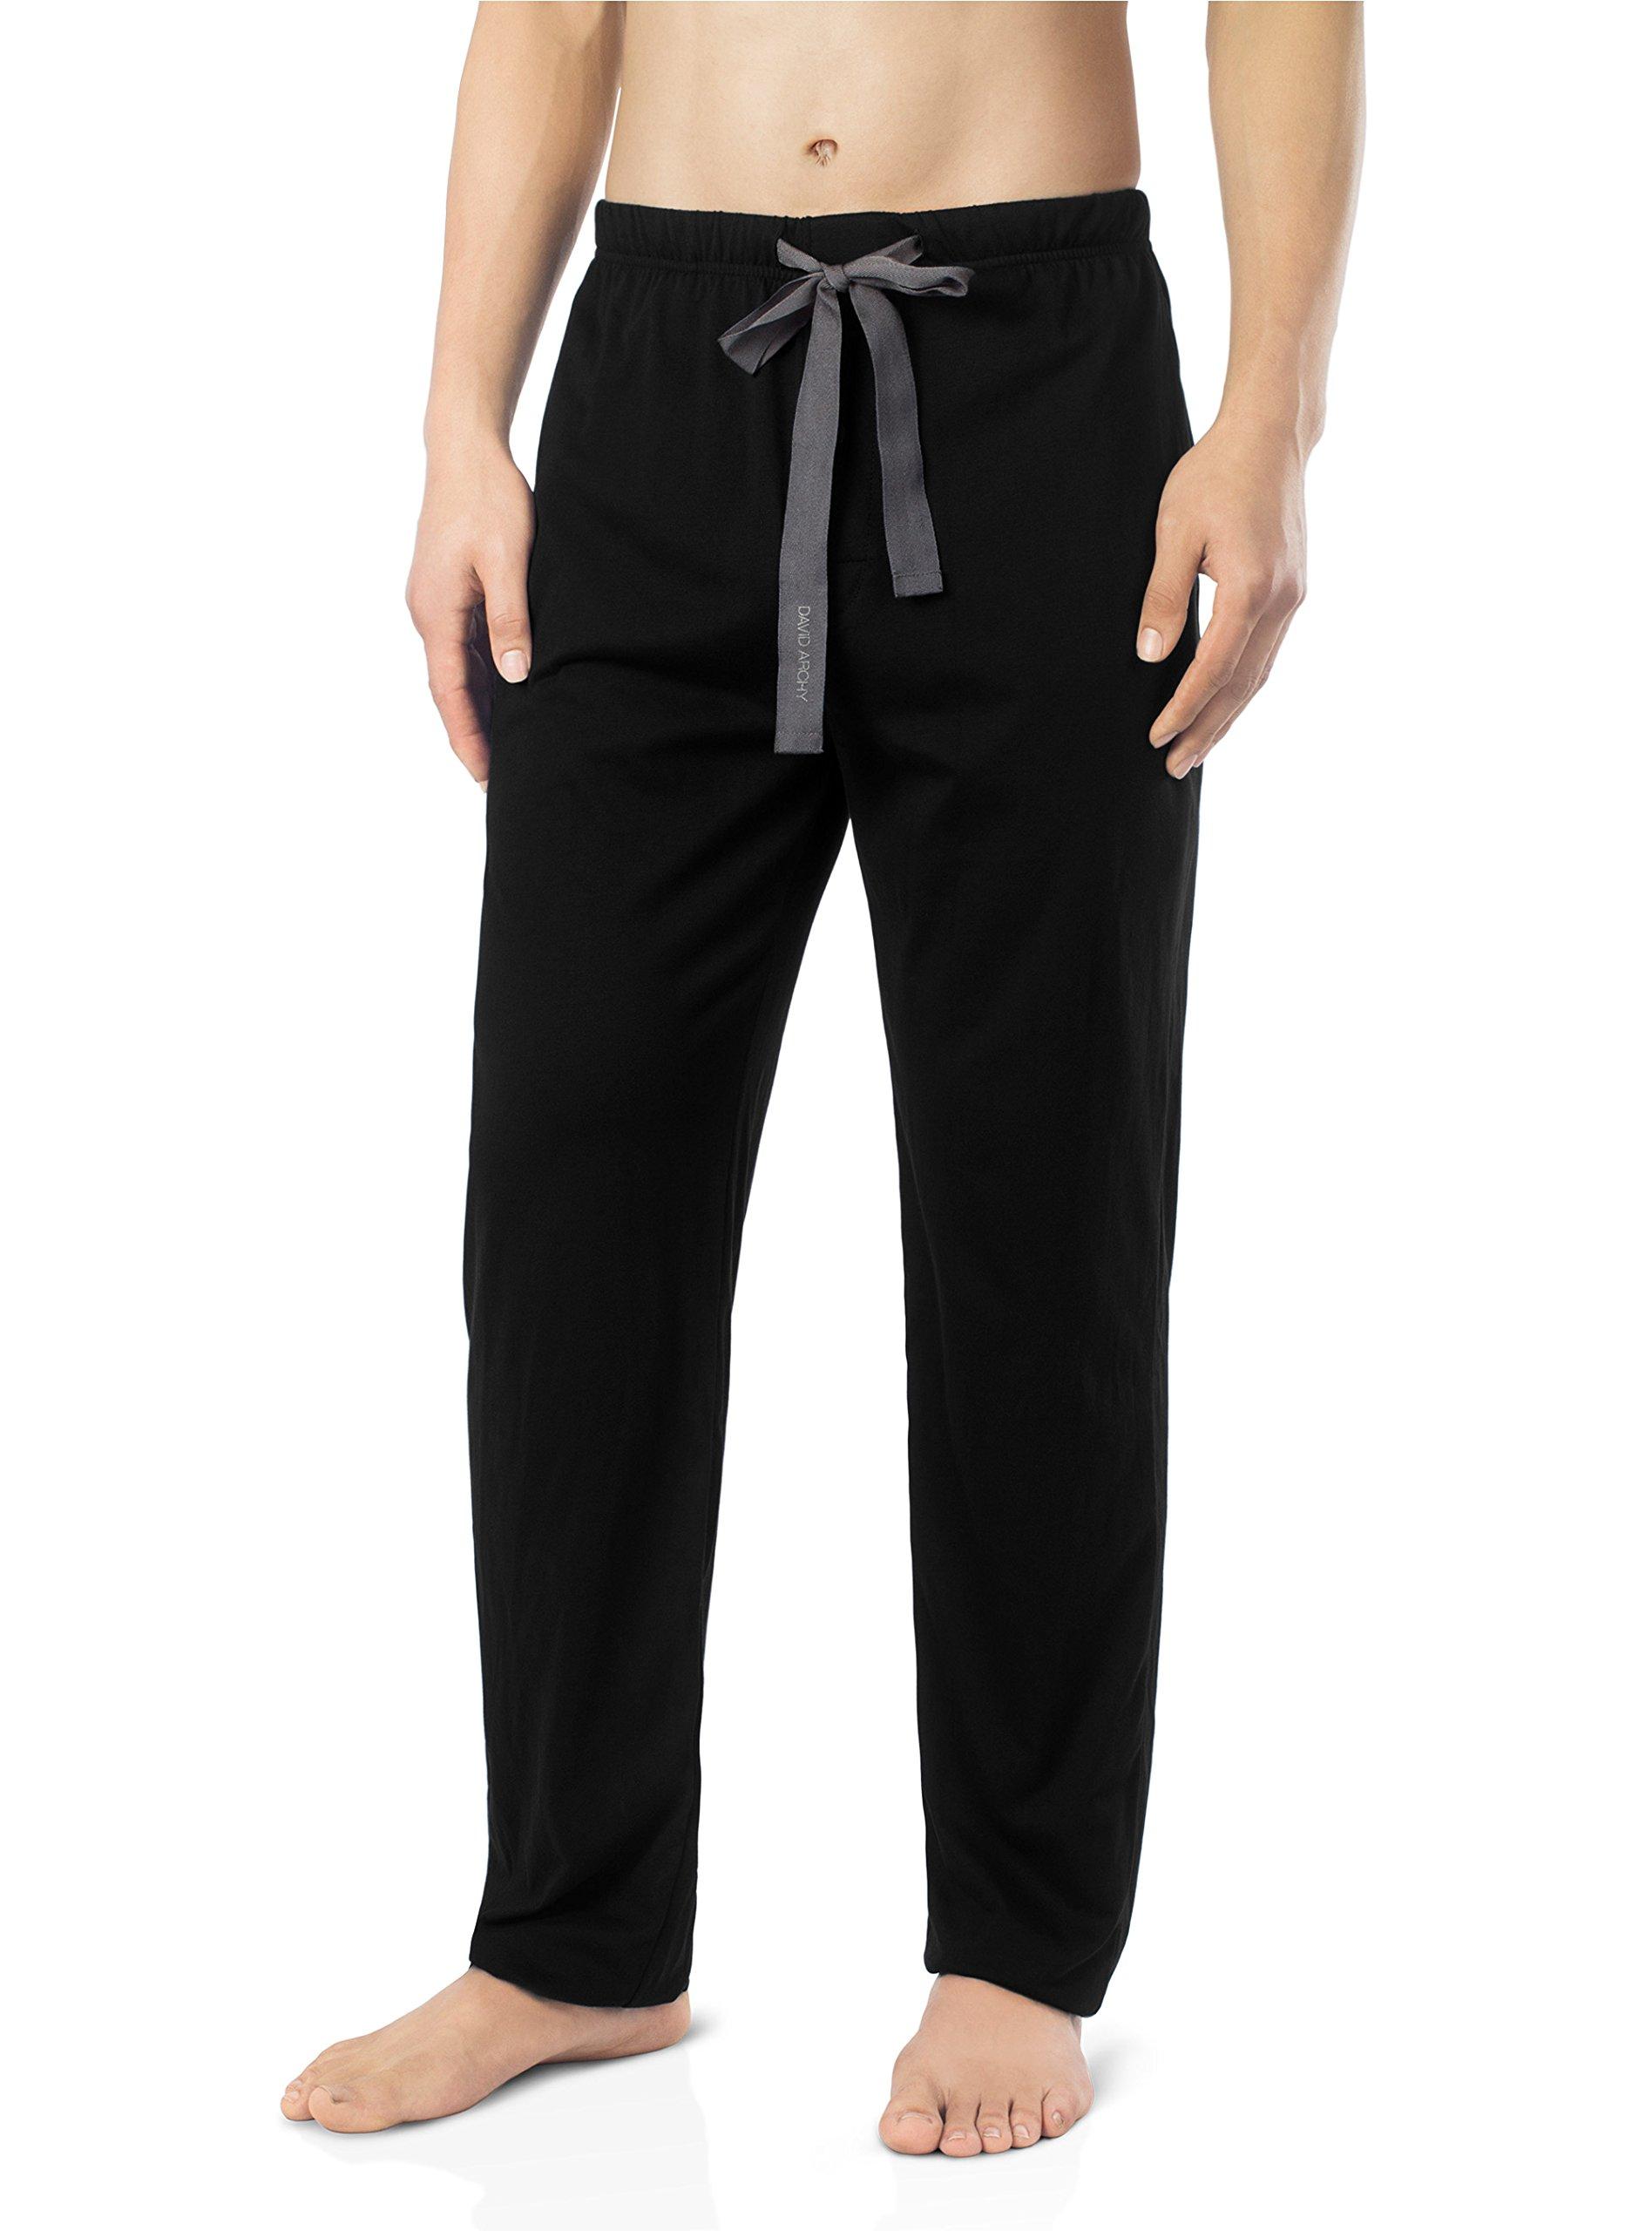 David Archy Men's Comfy Jersey Cotton Knit Pajama Lounge Sleep Pant in 1 Pack(M, Black)